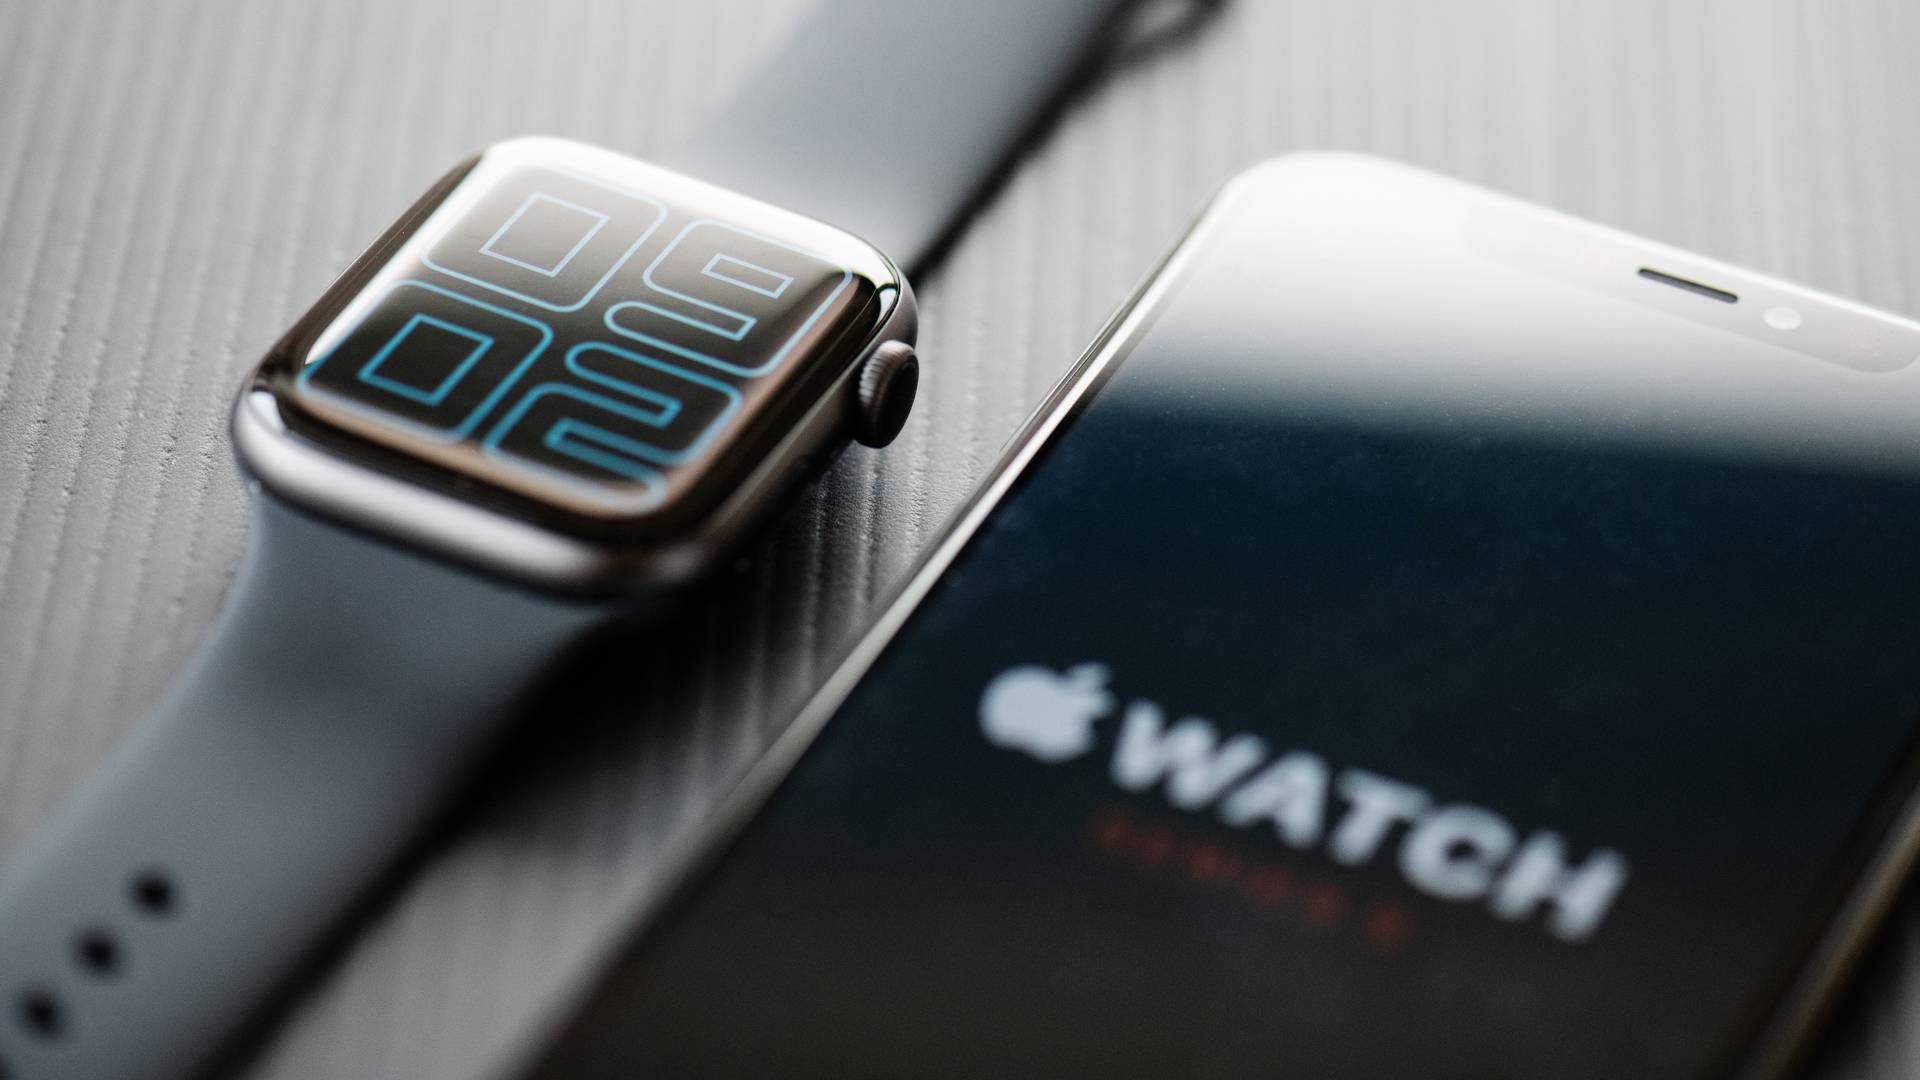 Apple Watch 5 ao lado de iPhone 11 em cima de mesa cinza